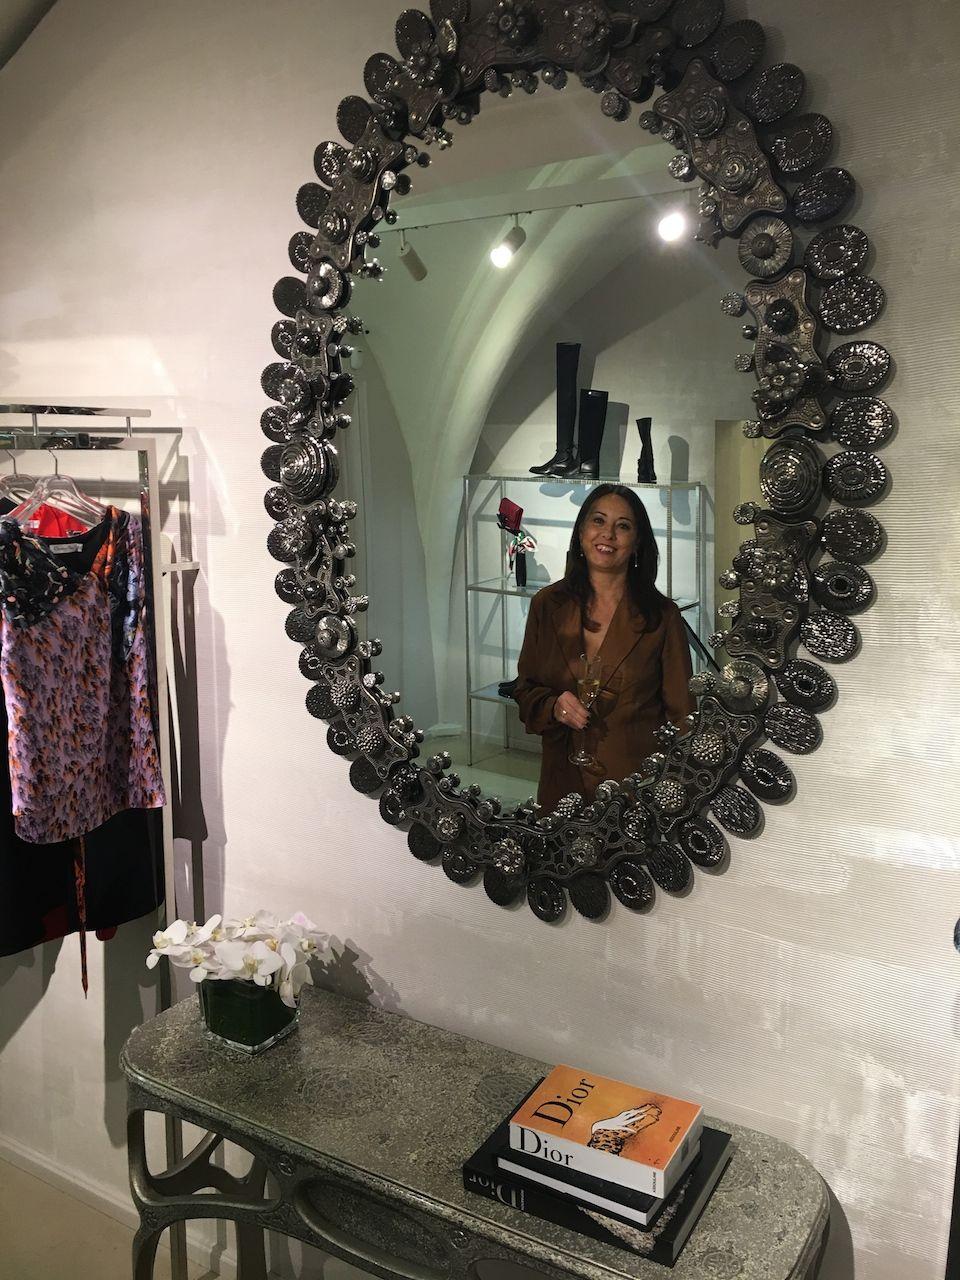 Boutique Dior Firenze